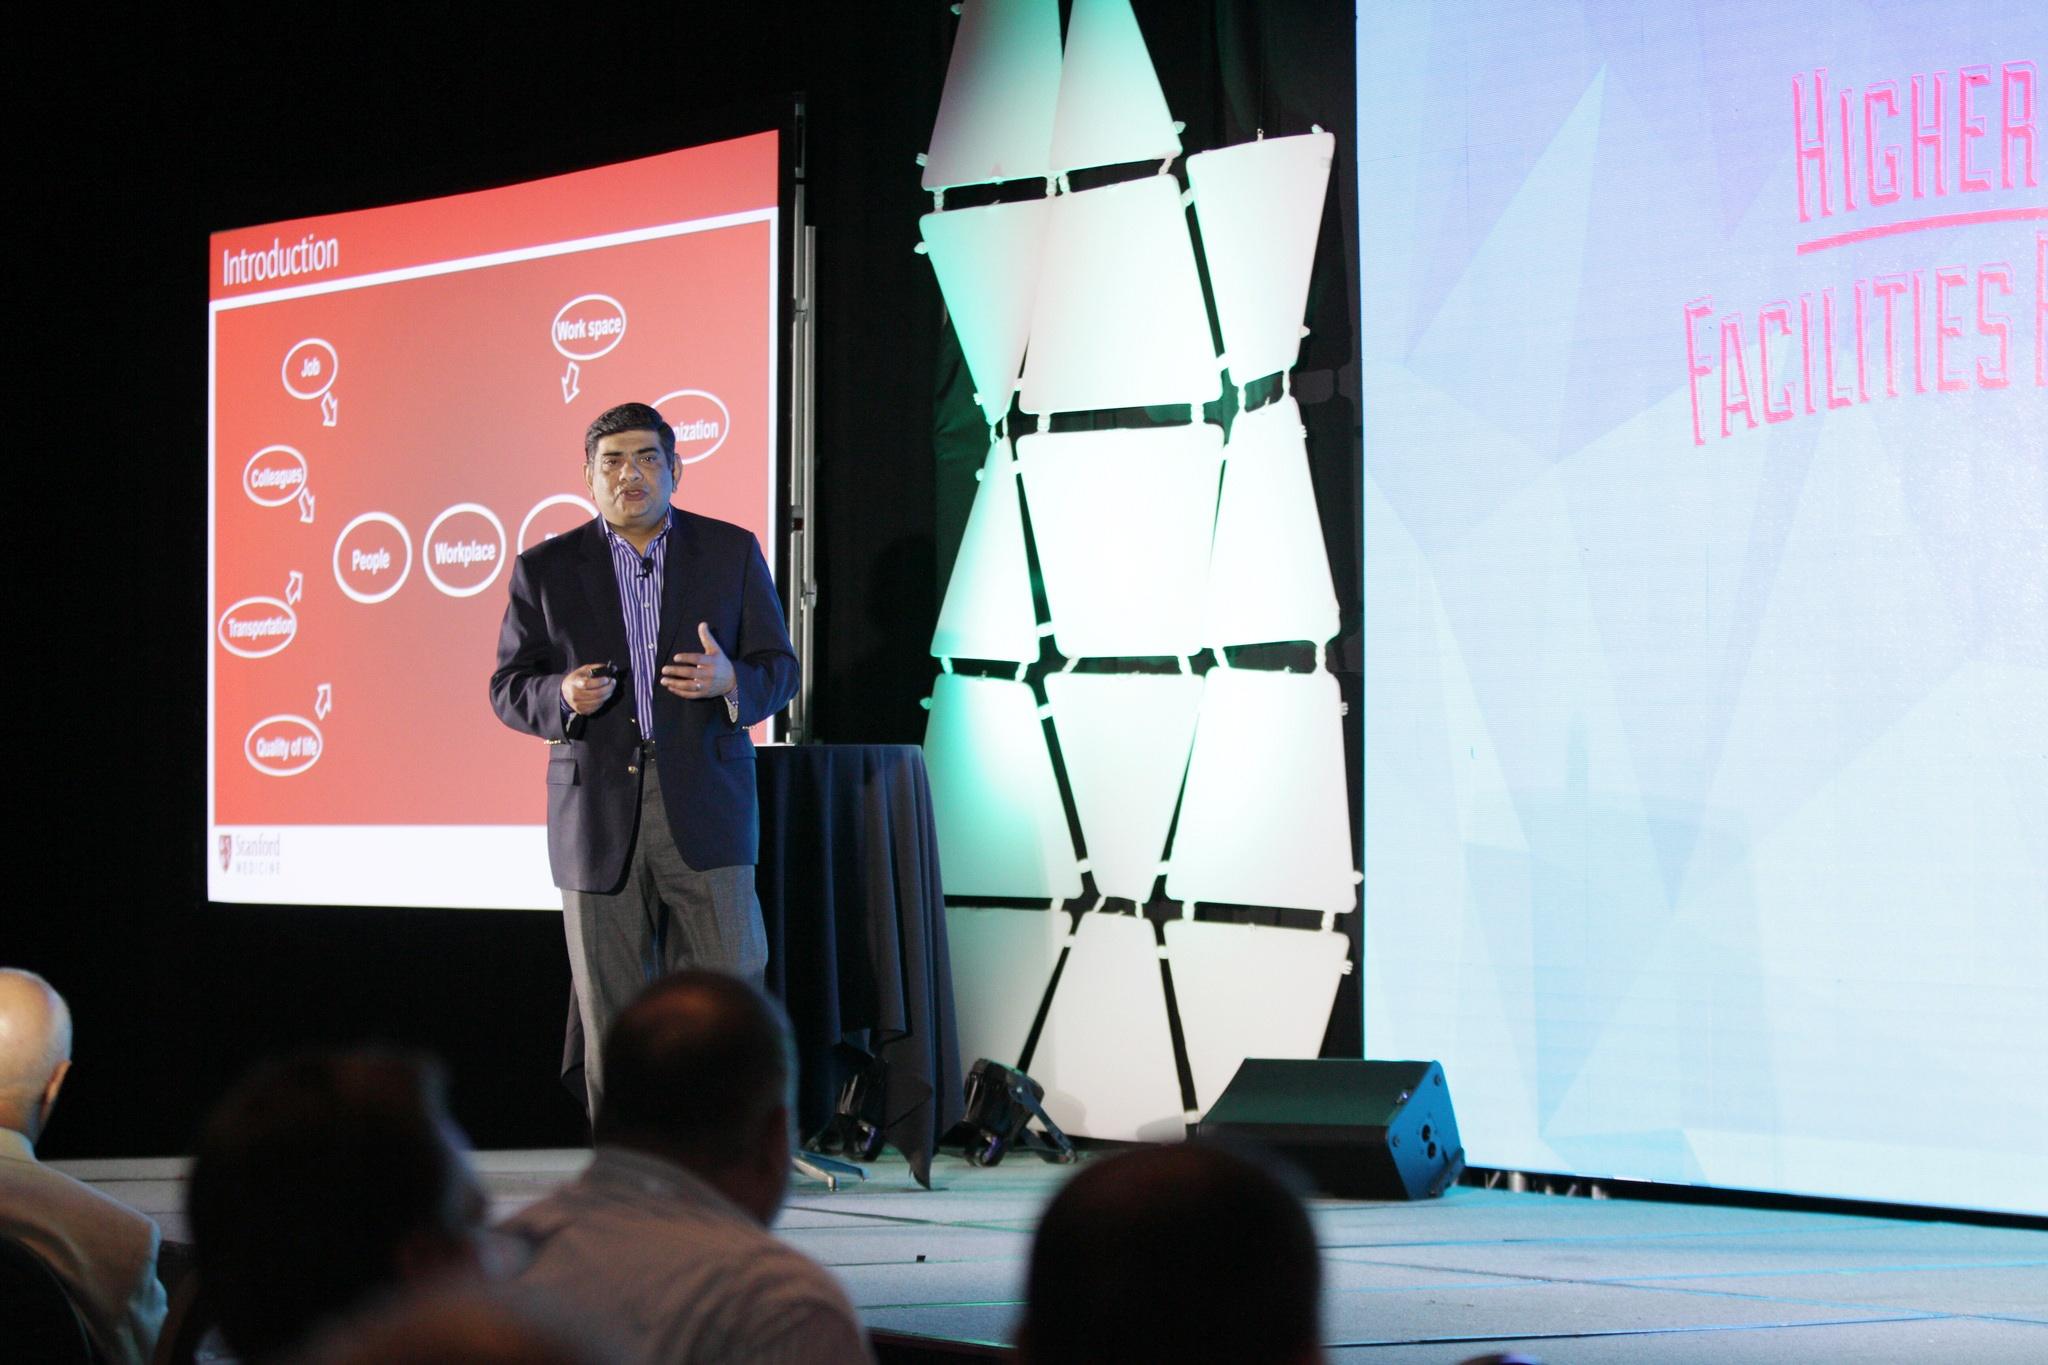 Niraj Dangoria - Stanford University School Of Medicine - speaking at Higher Ed Facilities Forum